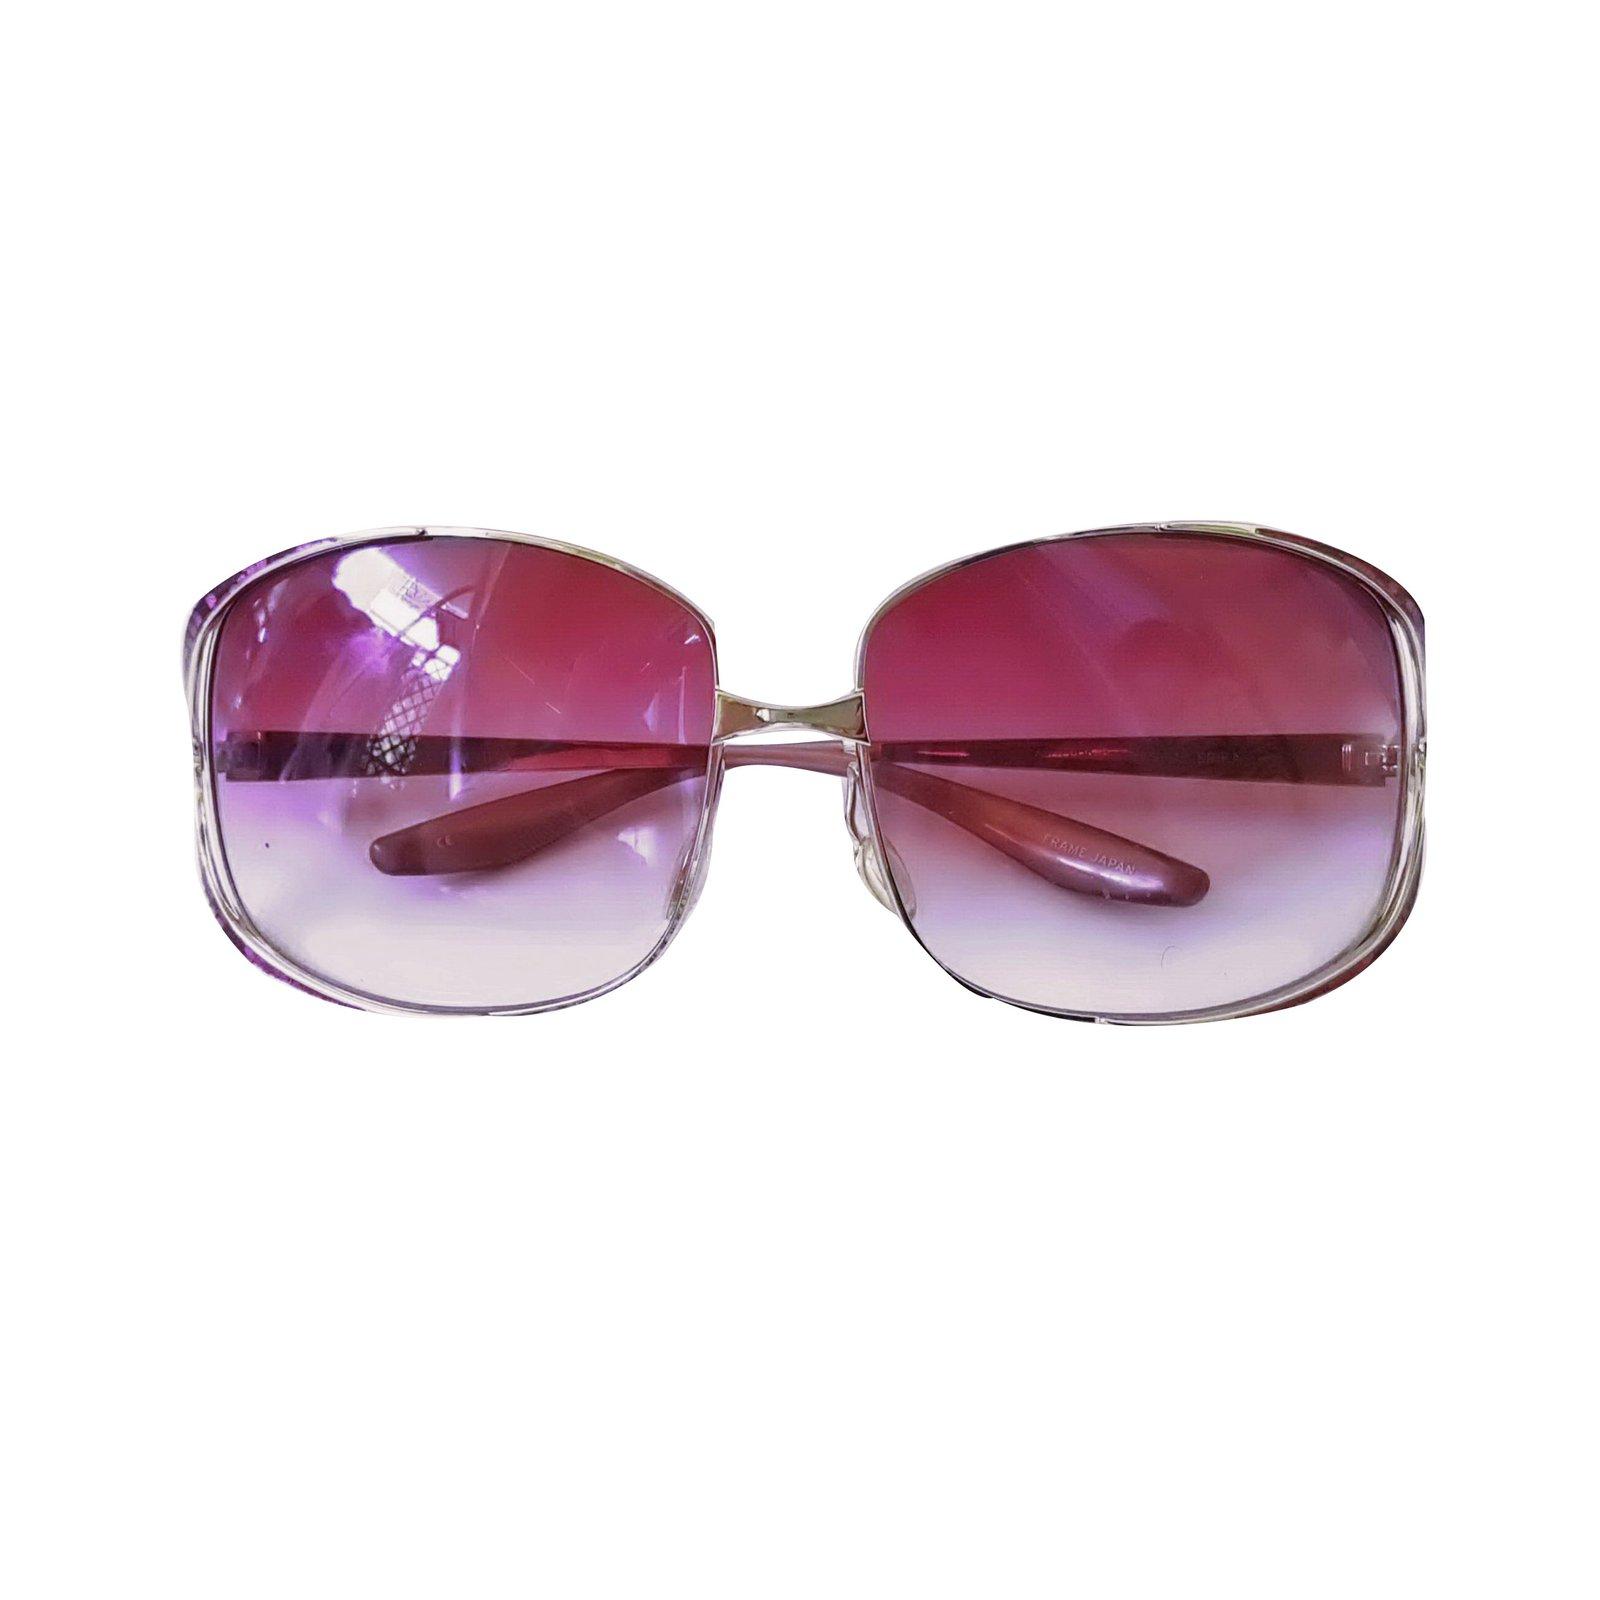 Barton Perreira Sunglasses Sunglasses Metal Pink ref.62098 - Joli Closet